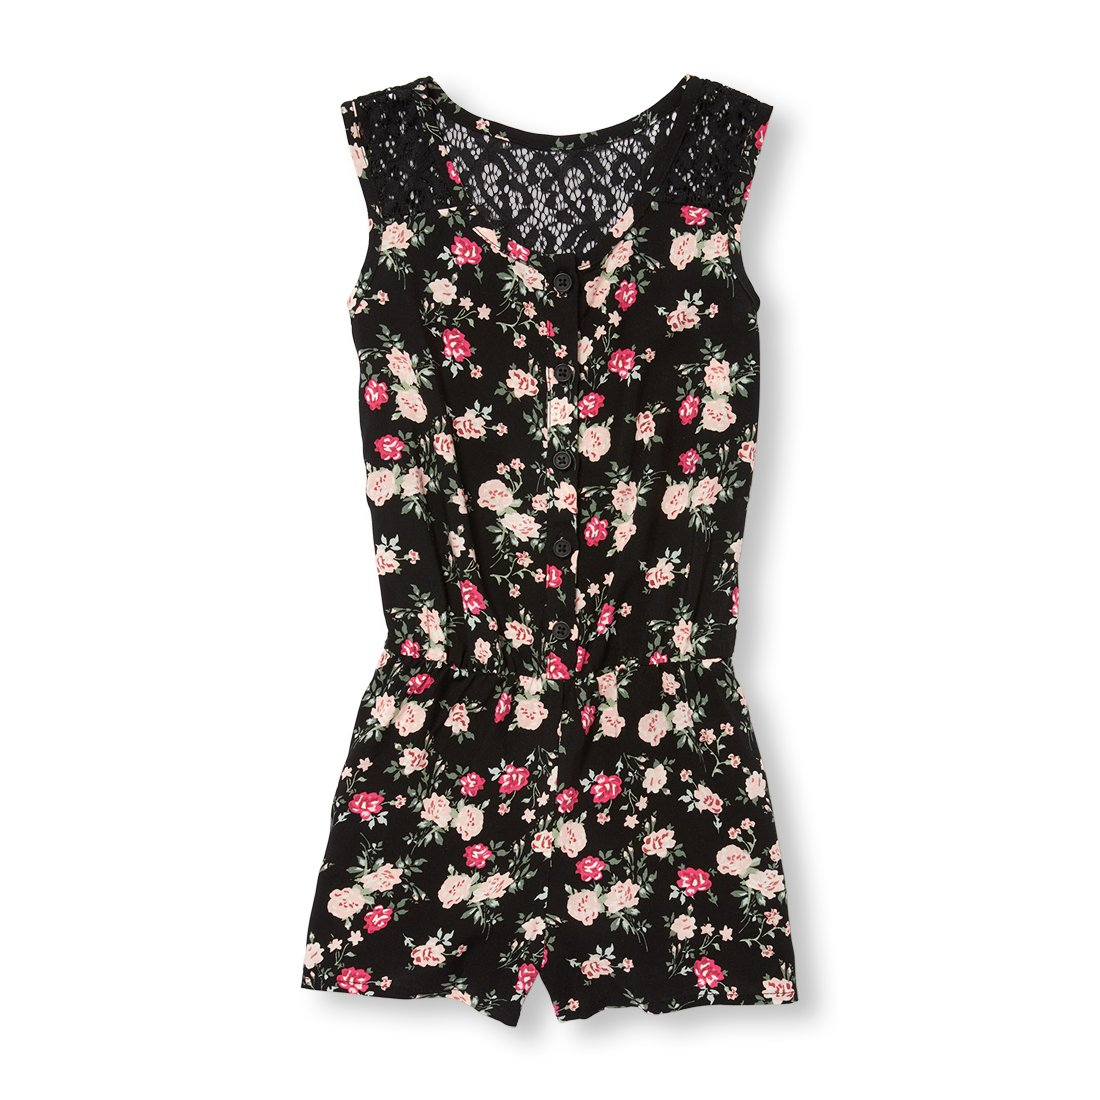 The Children's Place Big Girls' Floral Woven Romper, Black, XL (14)